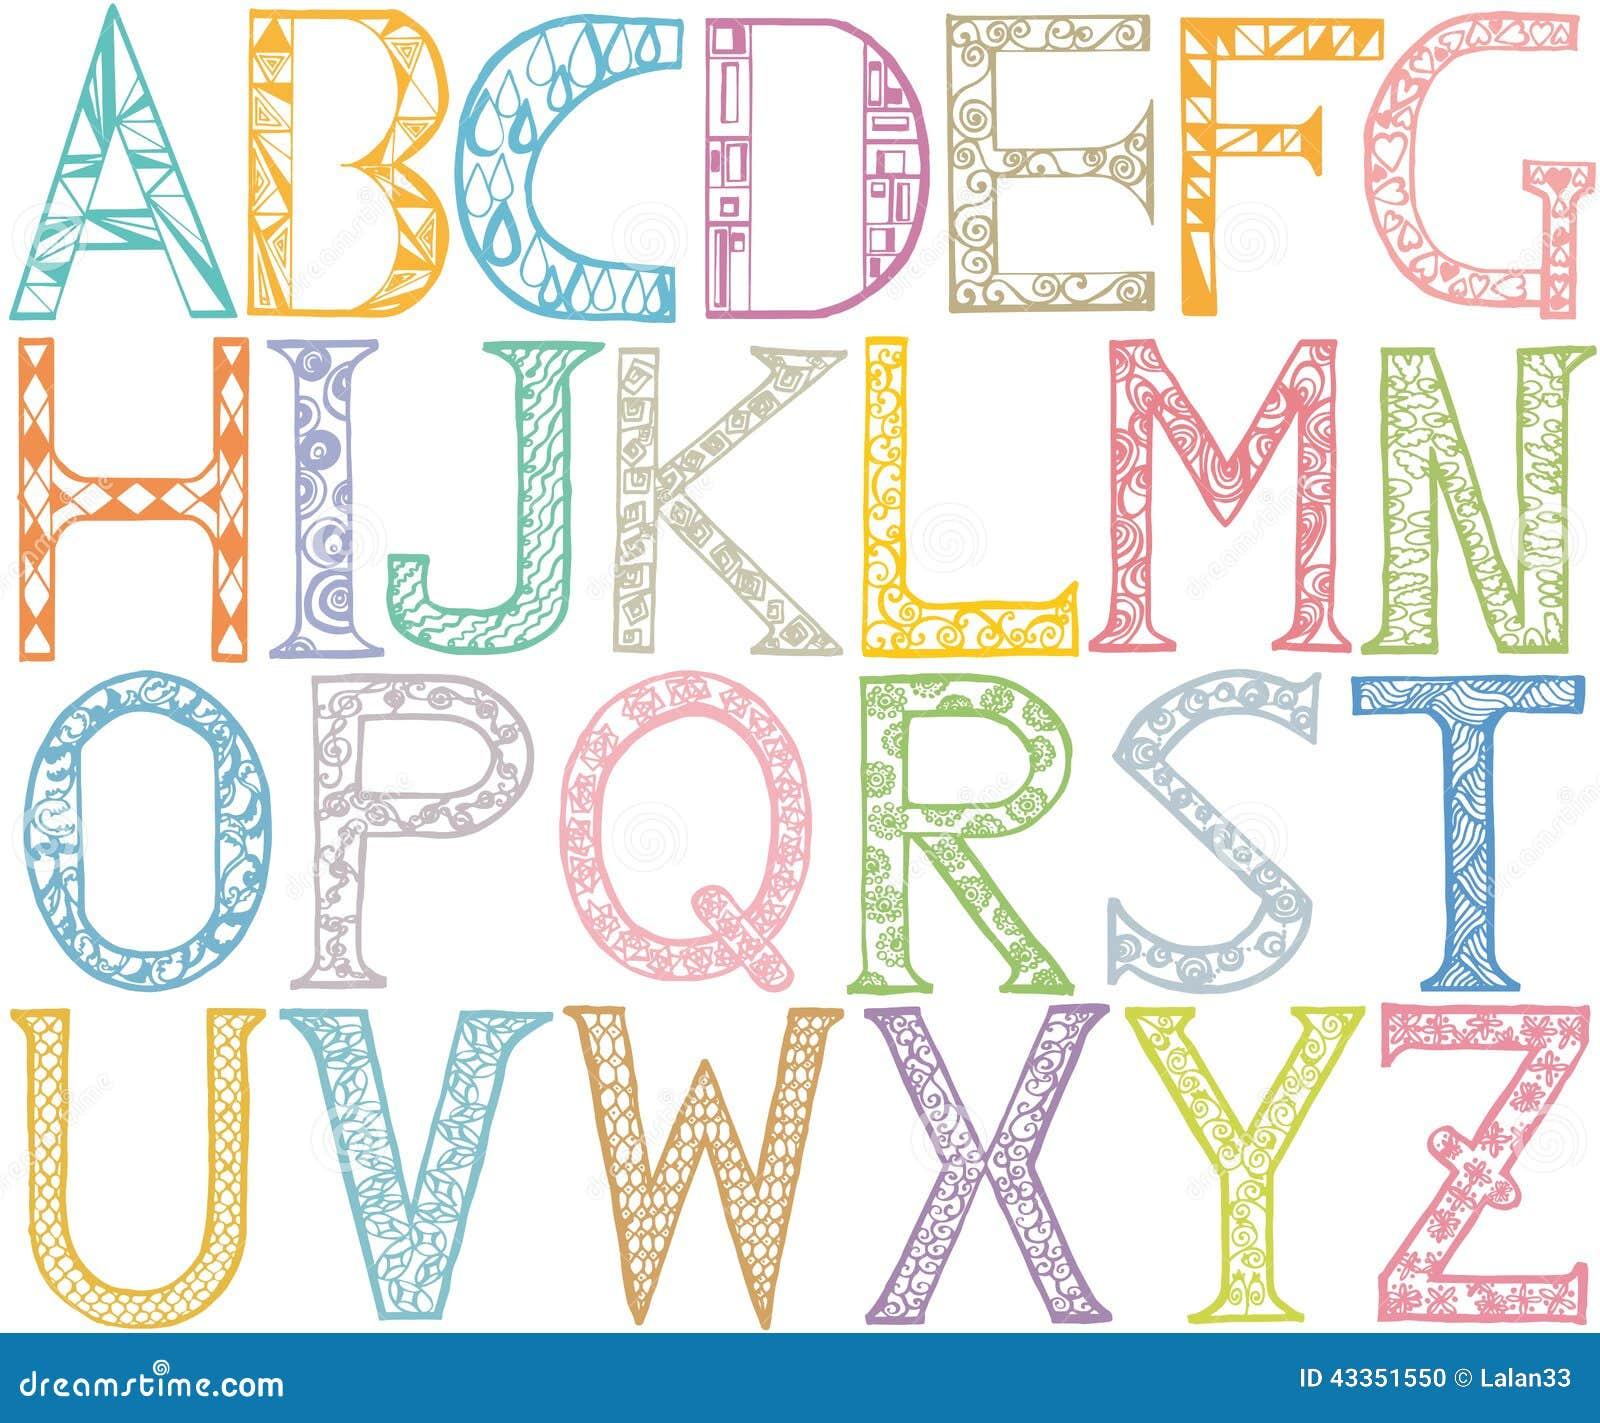 abc alphabet design stock vector image 43351550 thank you clipart funny Thank You Meme Funny